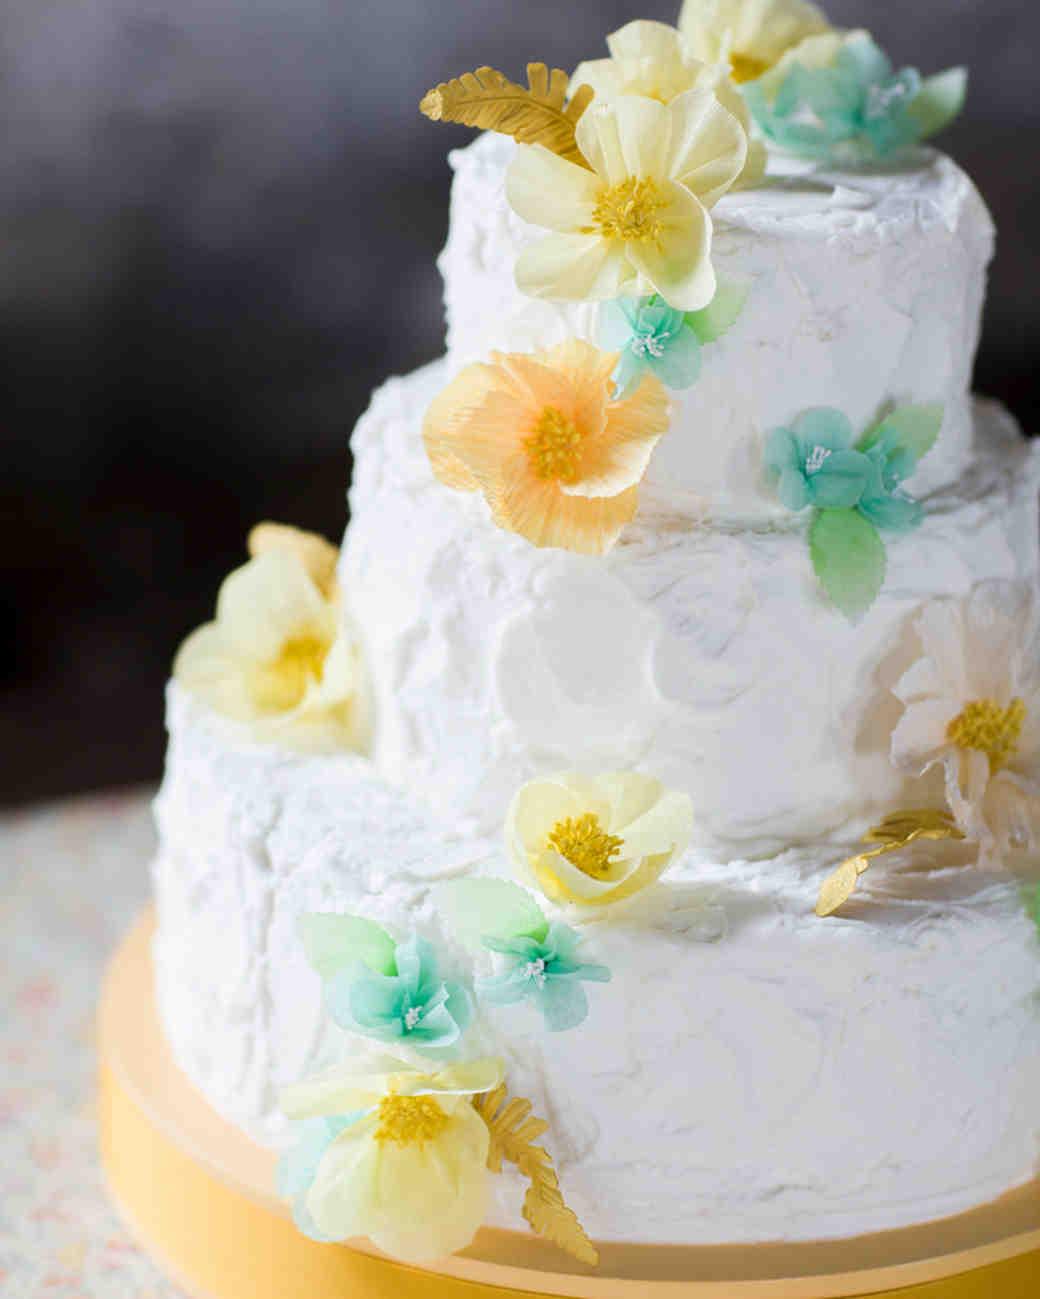 maggie-bryan-cake-0004-wd108897.jpg